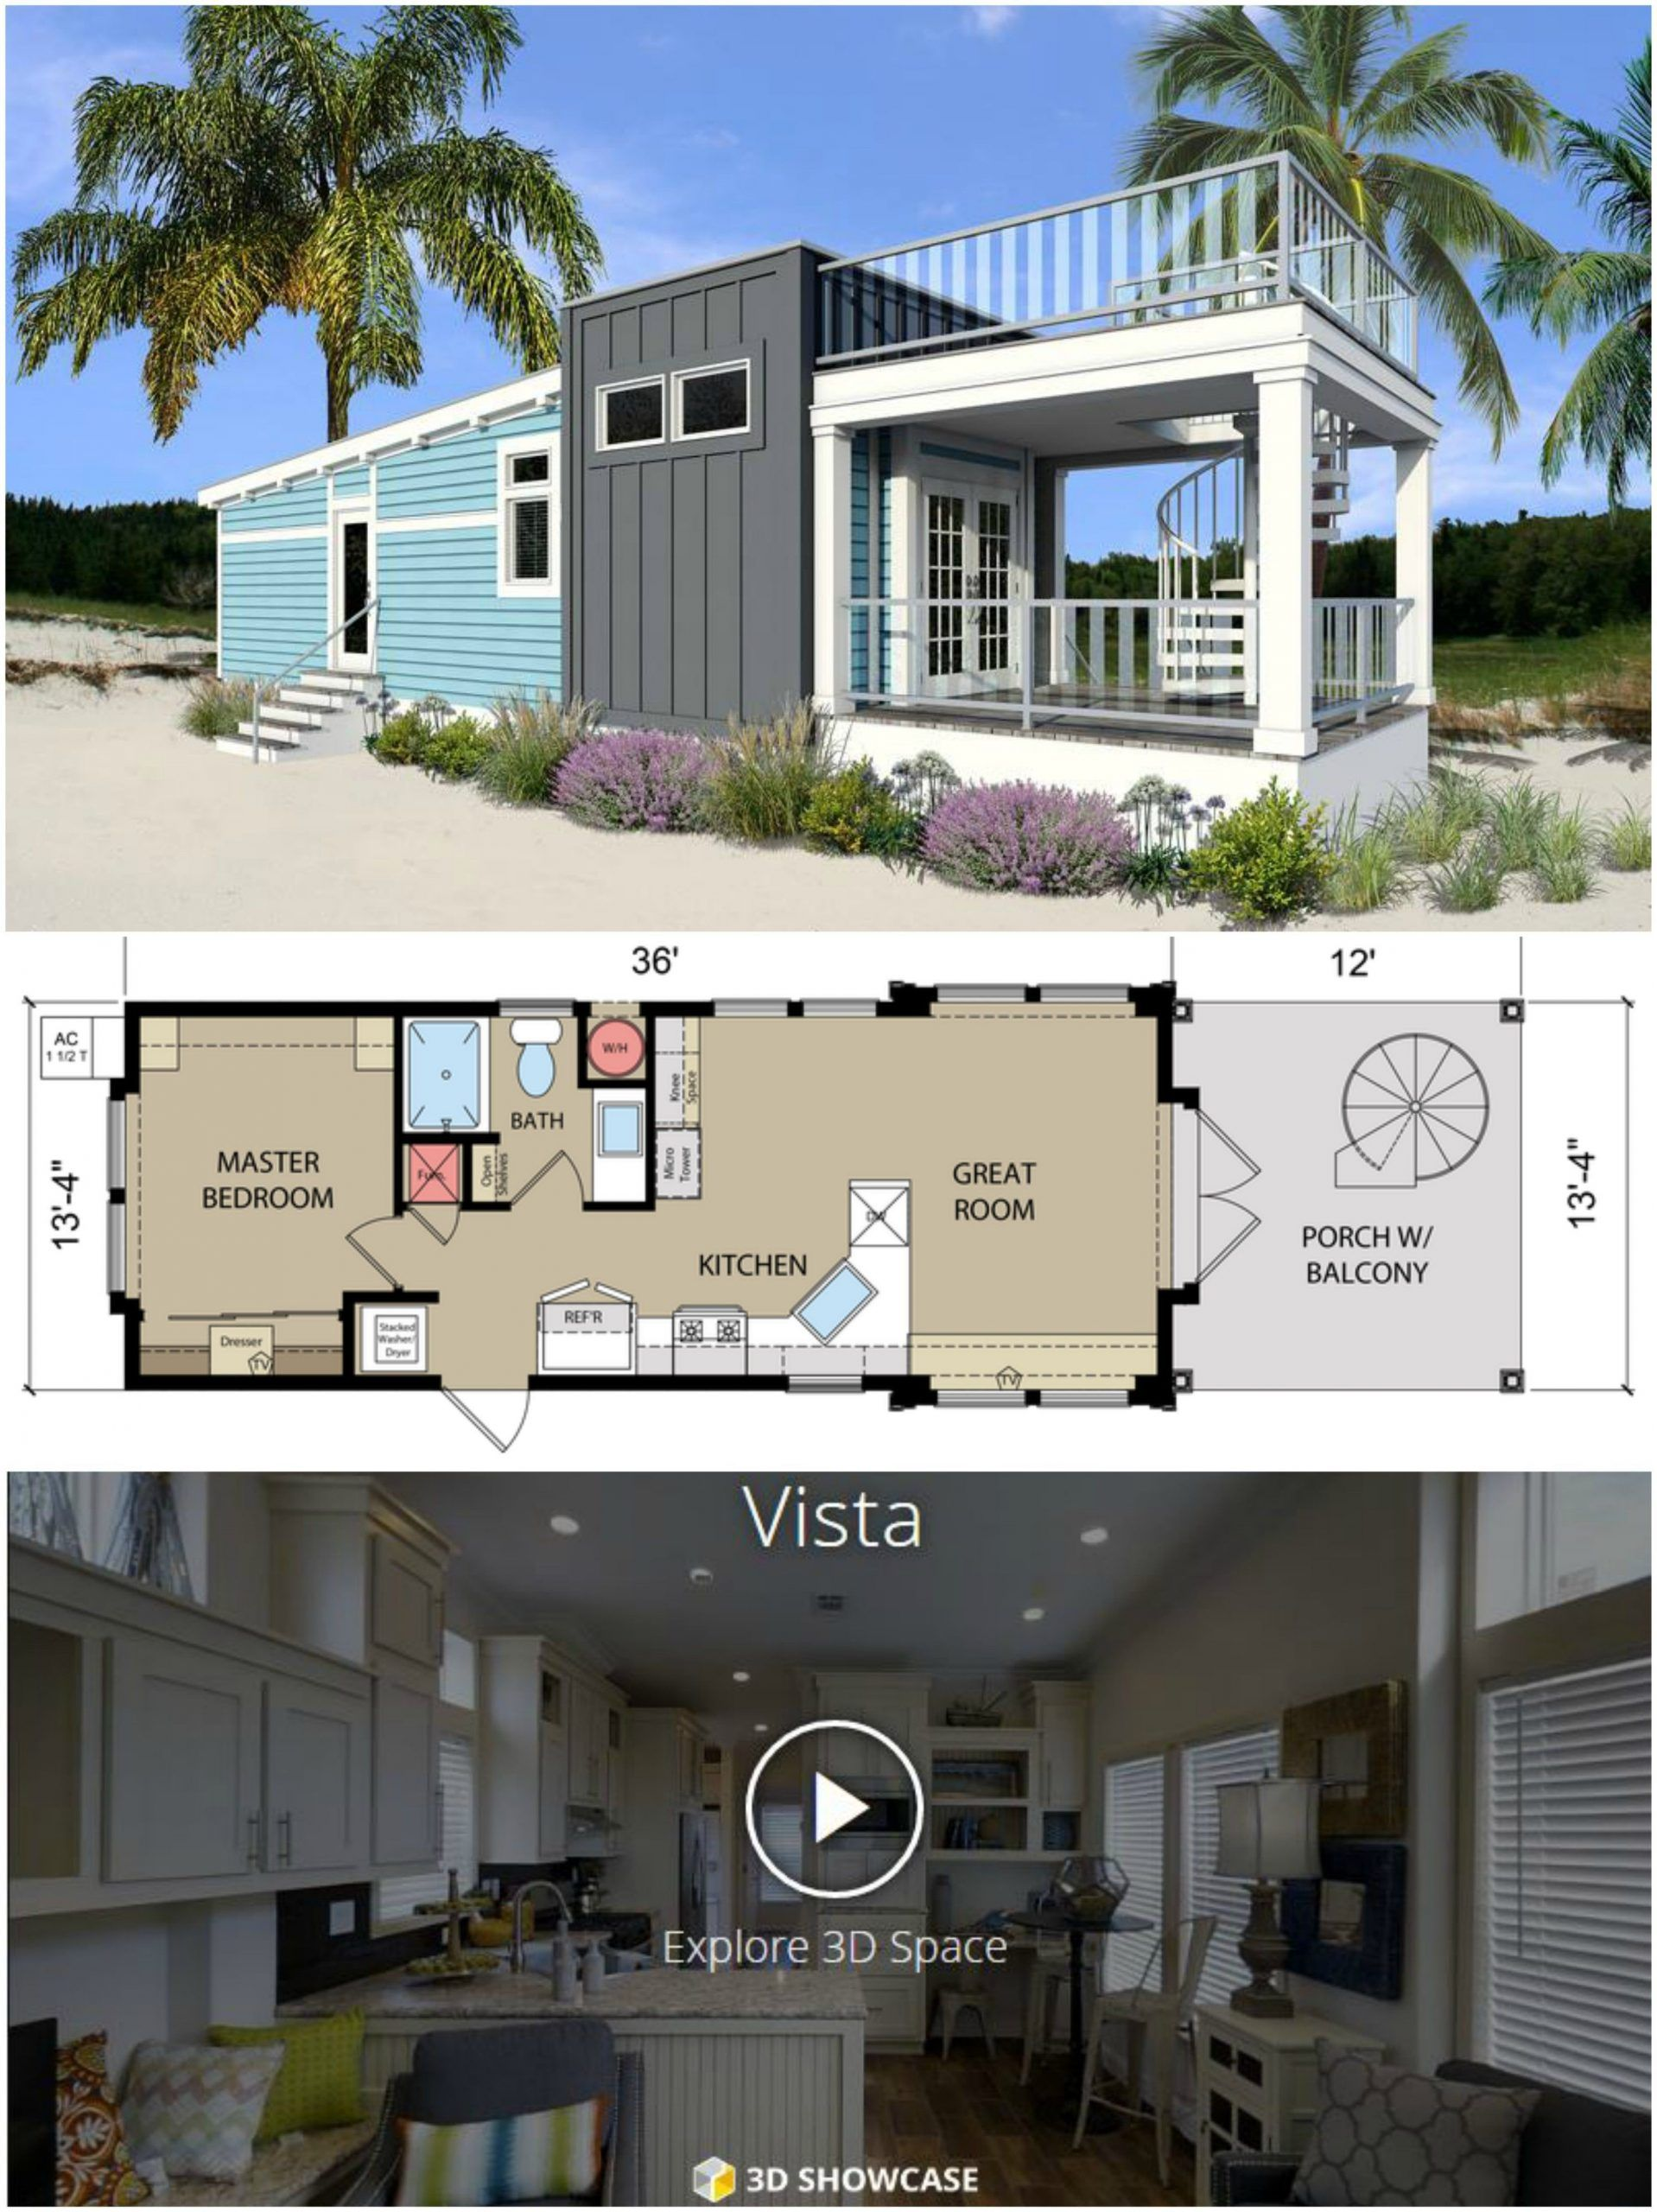 19 Delightful Coastal Kitchen Bath Ideas Rooftopterrace 3 Vibrant Tips And Tri Bath Coastal Delightful In 2020 Coastal Cottage Coastal Kitchen Tiny House Plans